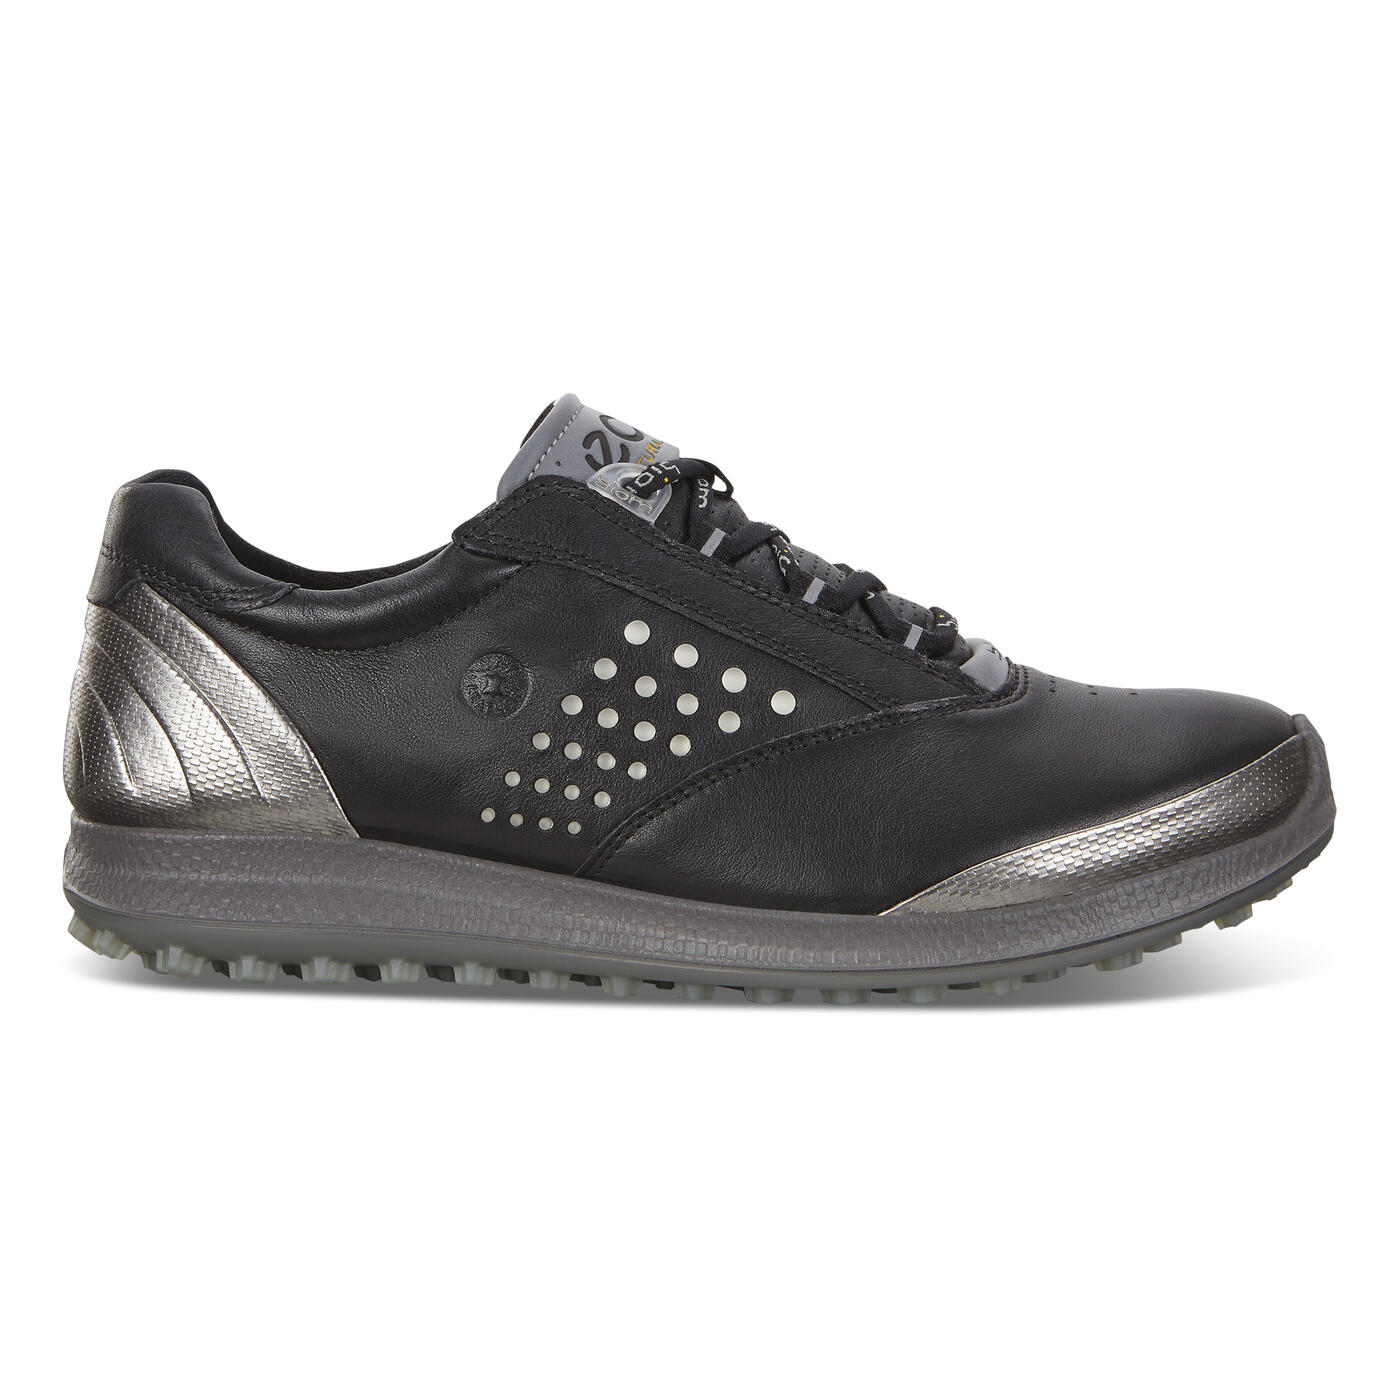 ECCO BIOM HYBRID 2 Women's Golf Shoe